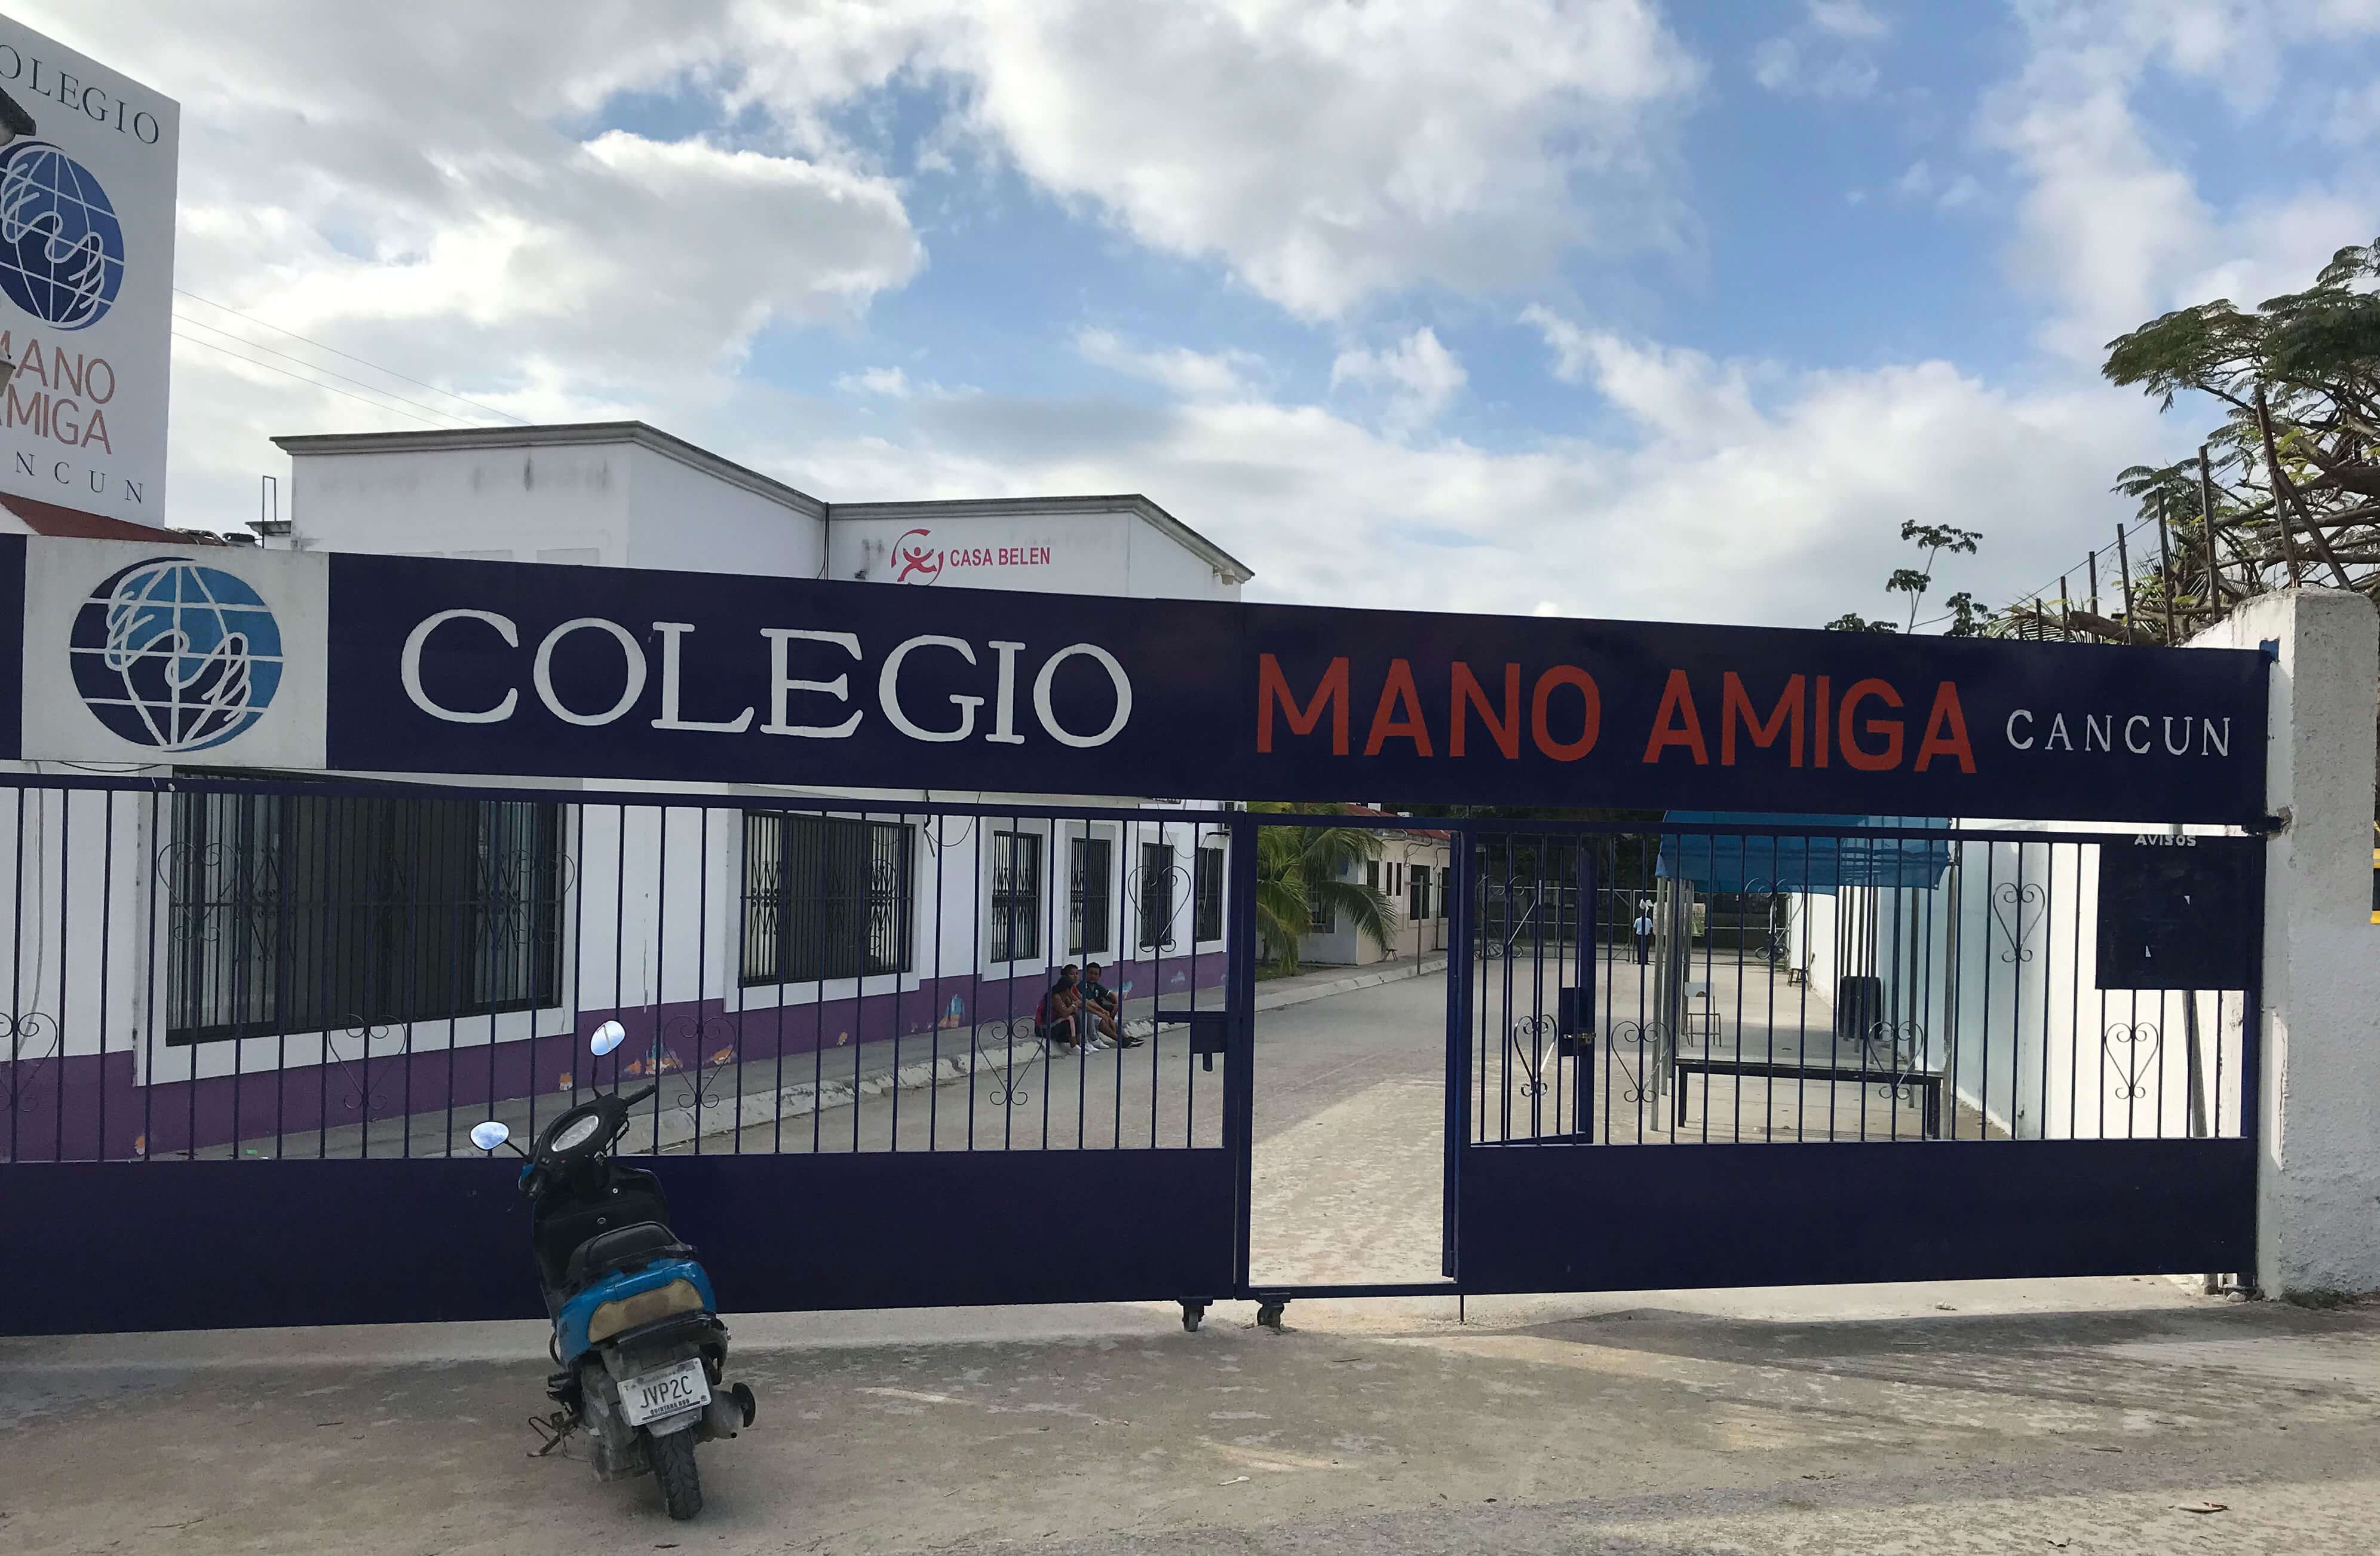 Entrance to Mano Amiga Cancun